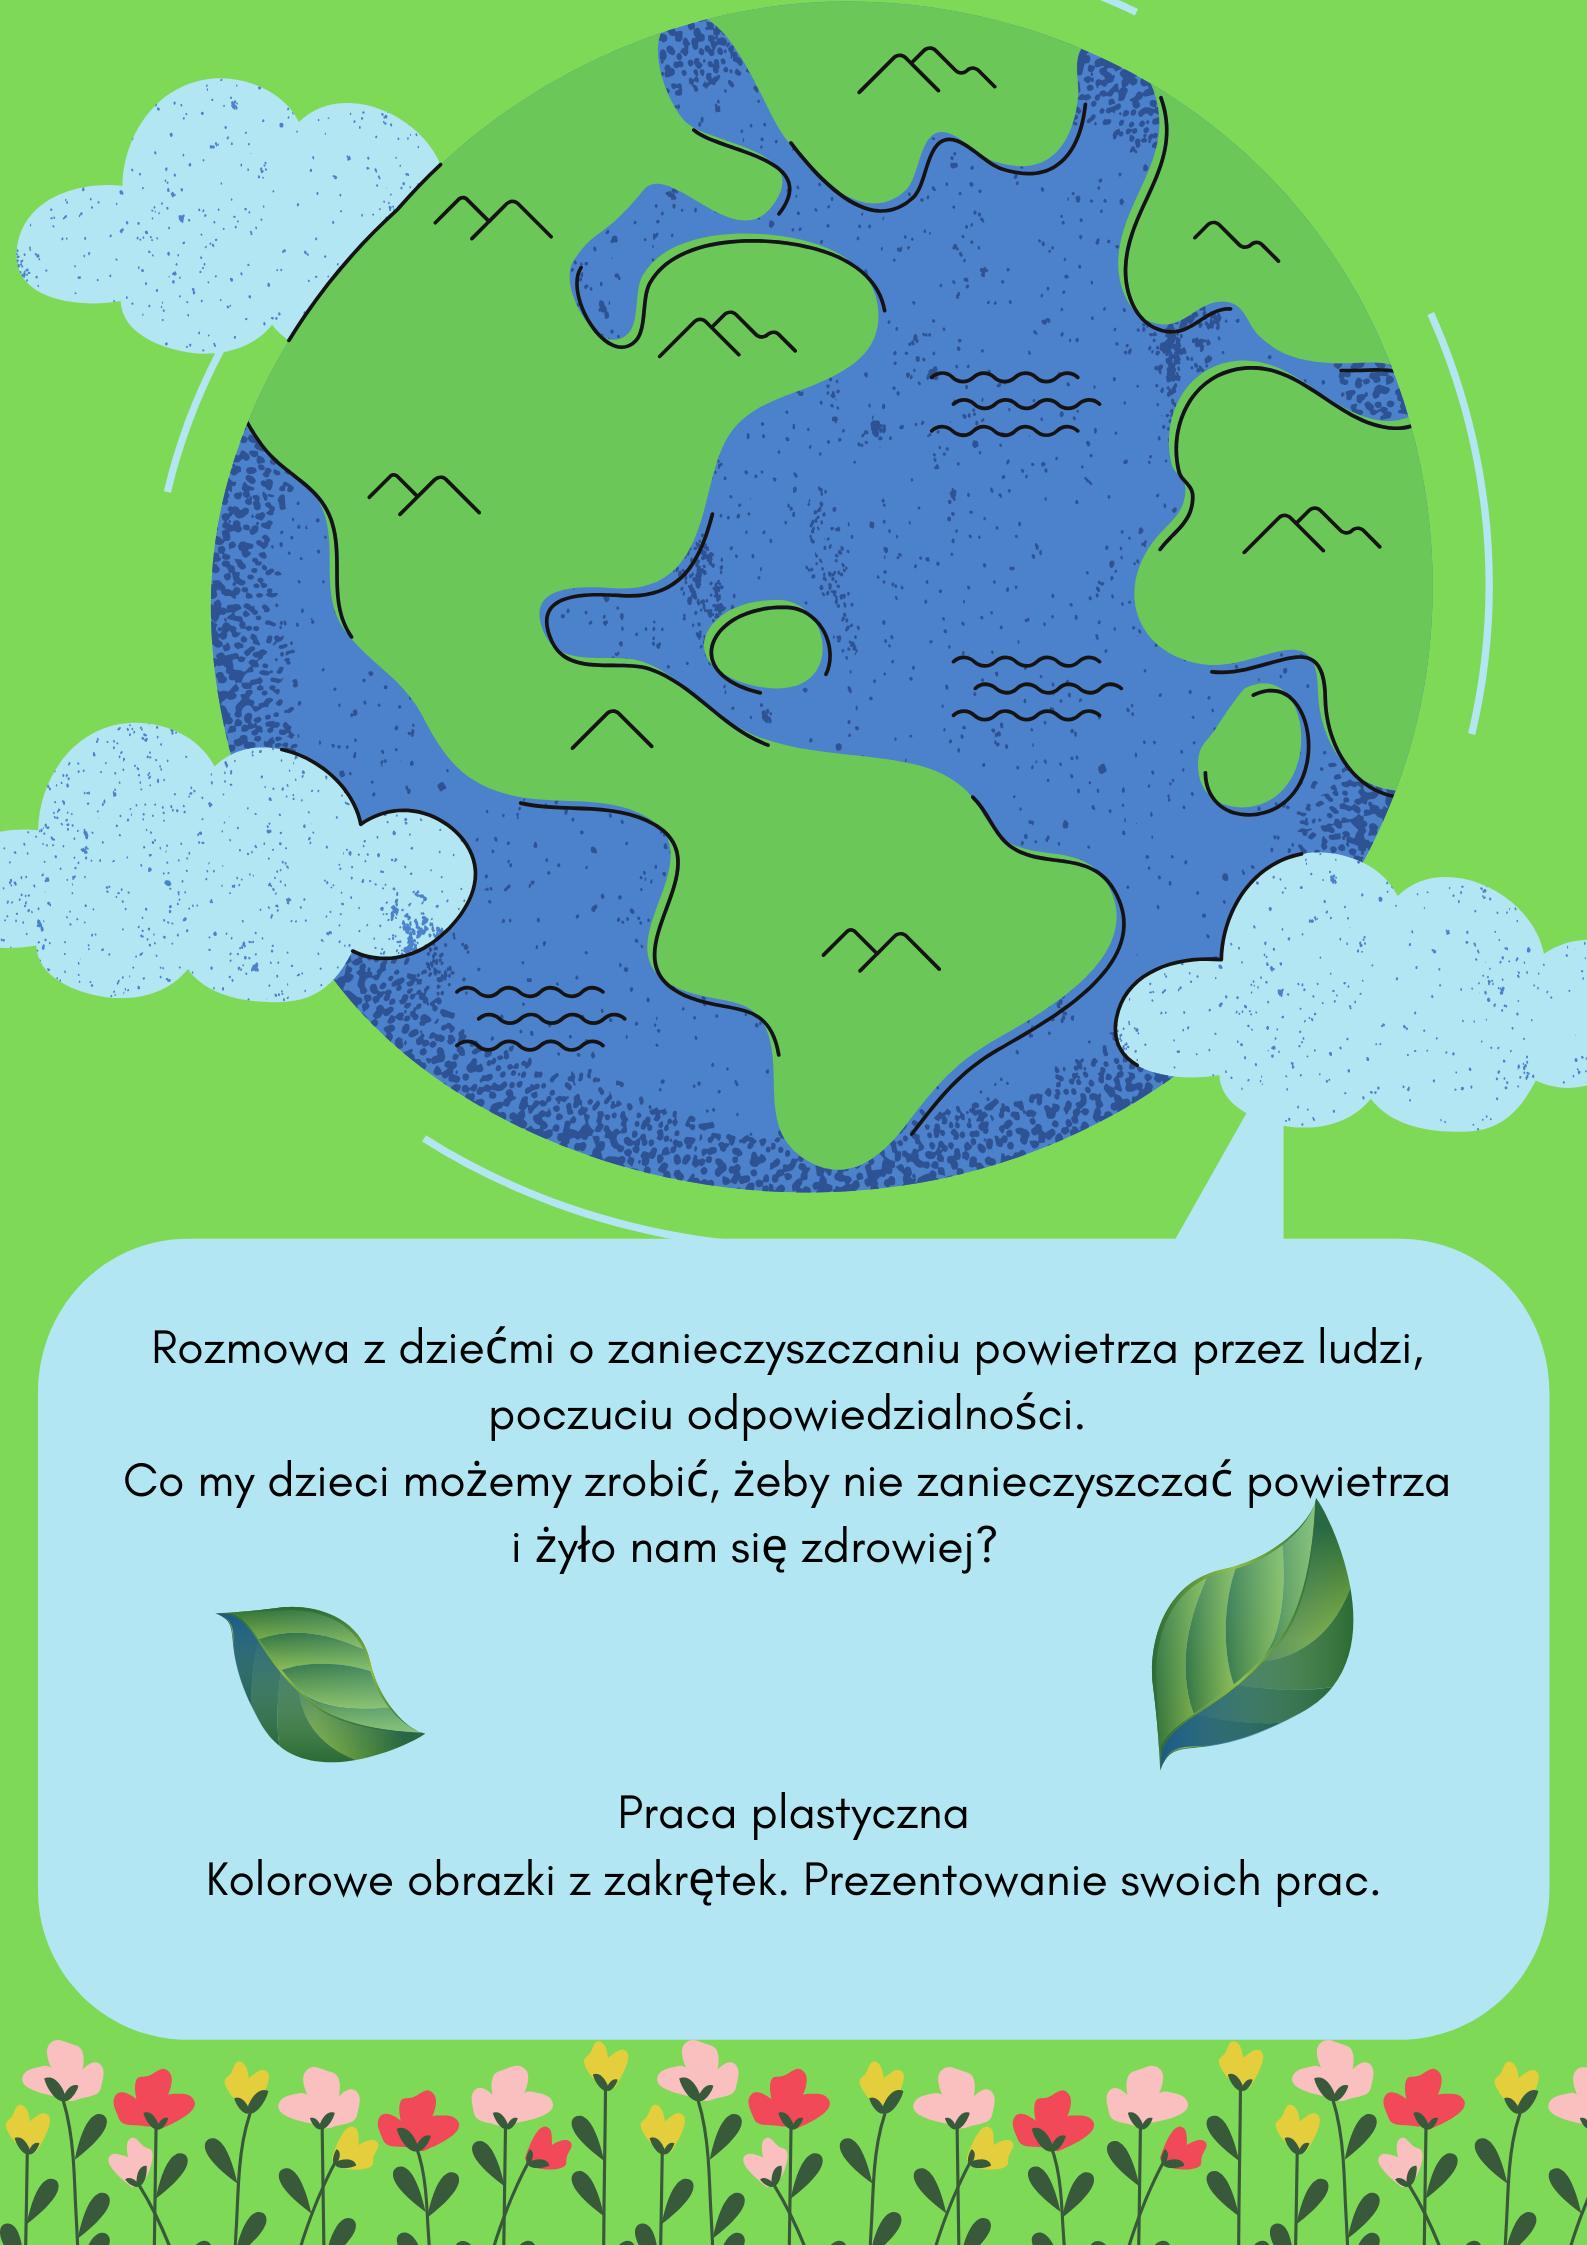 ekologia 2.png